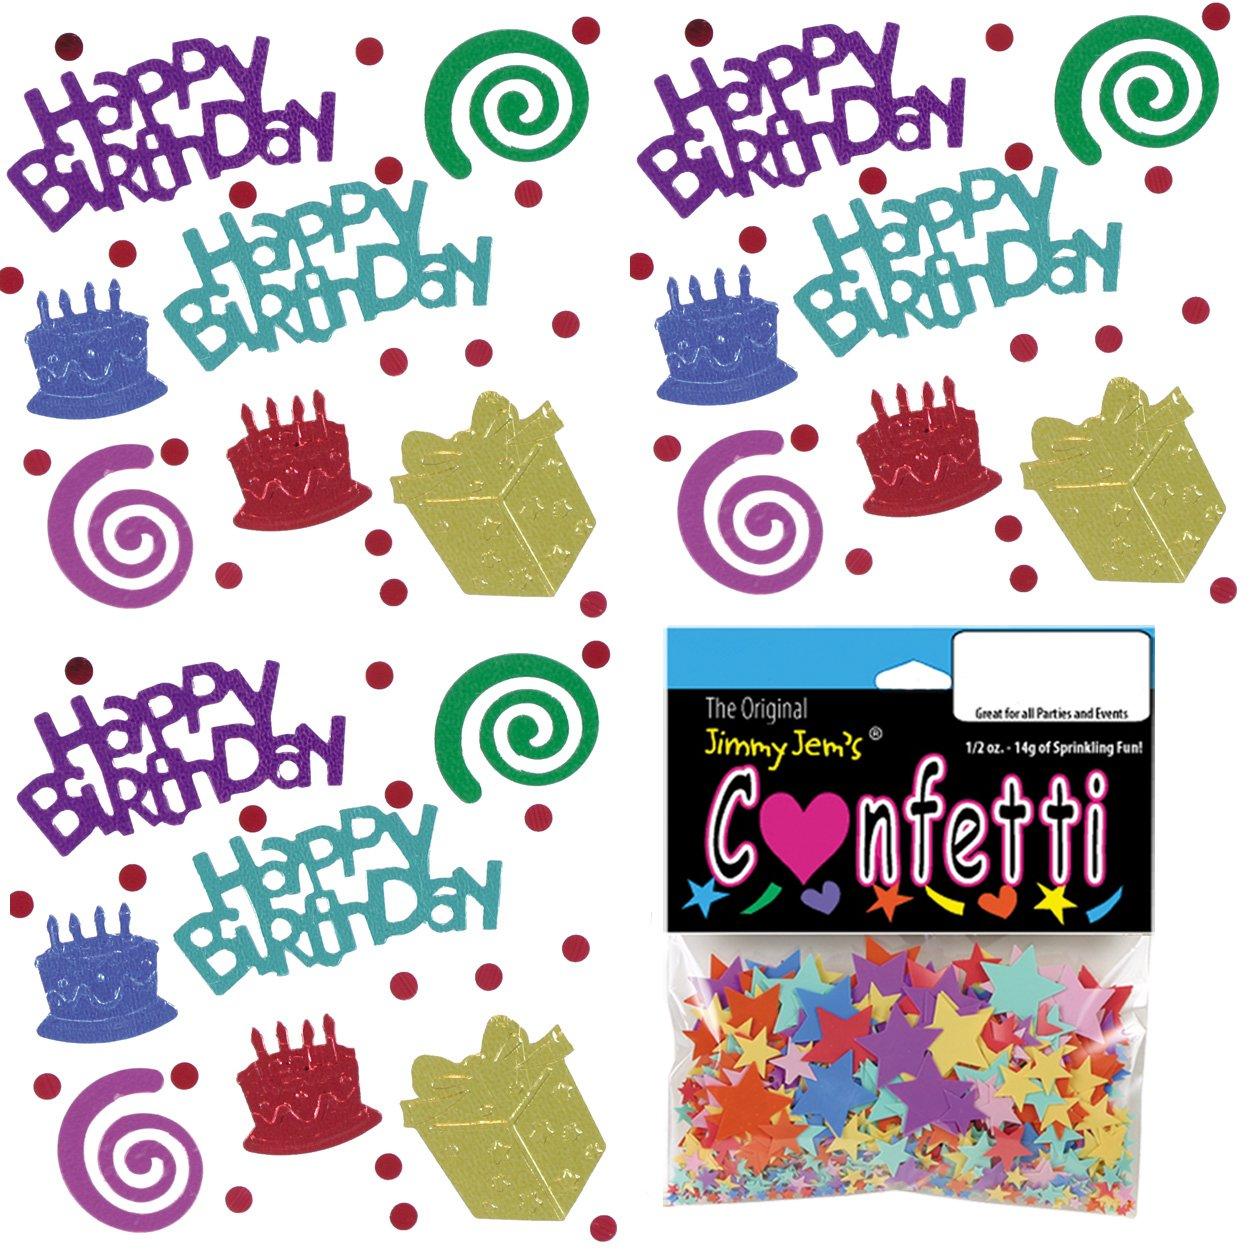 Confetti Mix - Birthday Blast - 4 Half Oz Bags (2 oz) (9224)